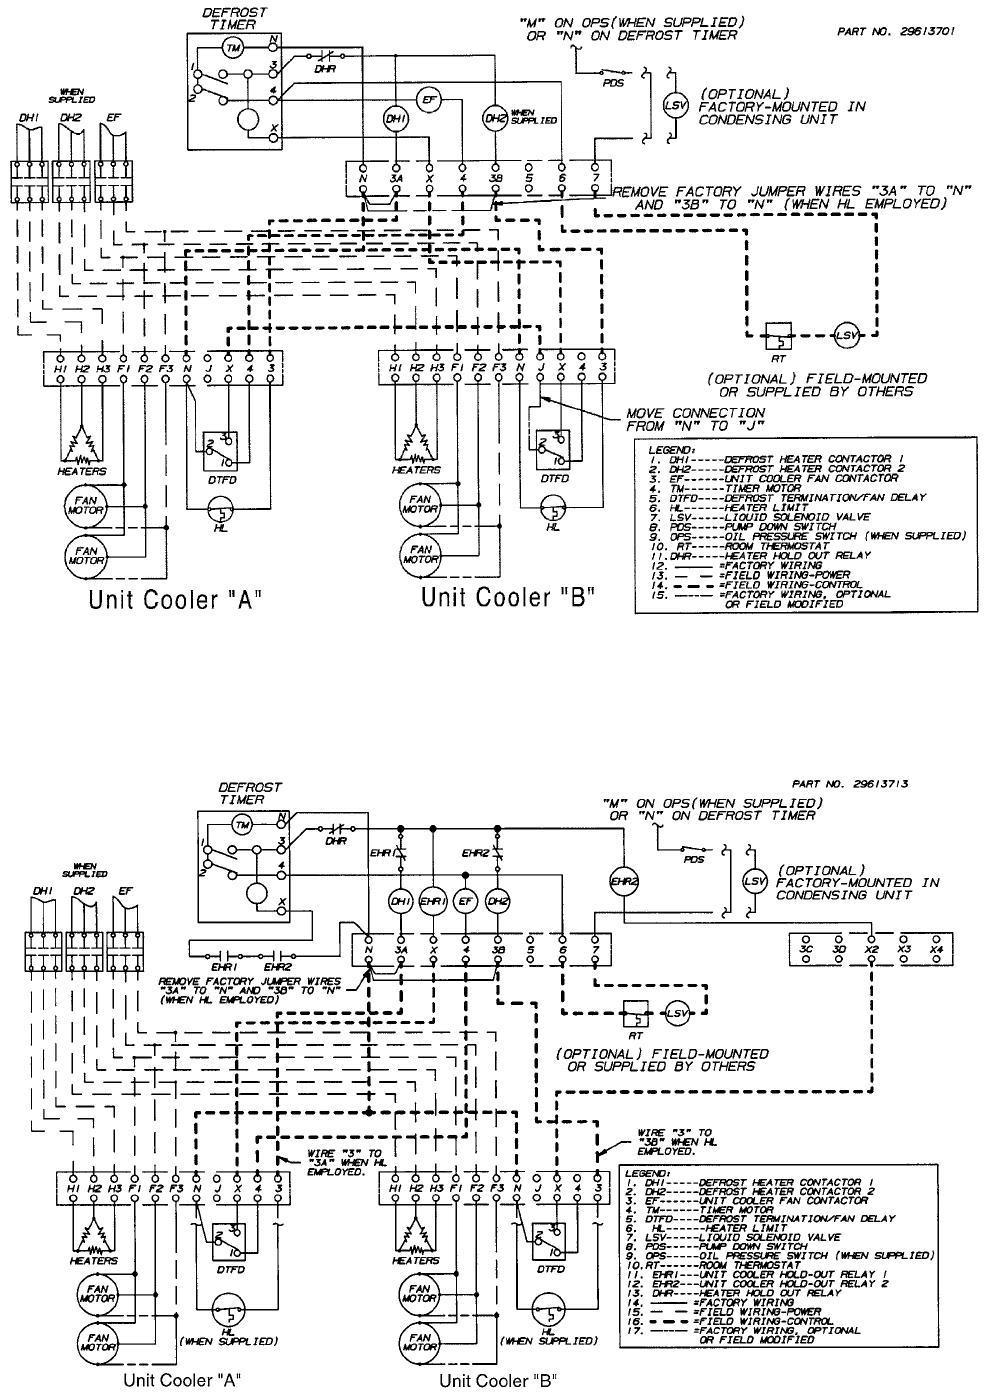 Heatcraft Refrigeration Products H-IM-64L Installation And